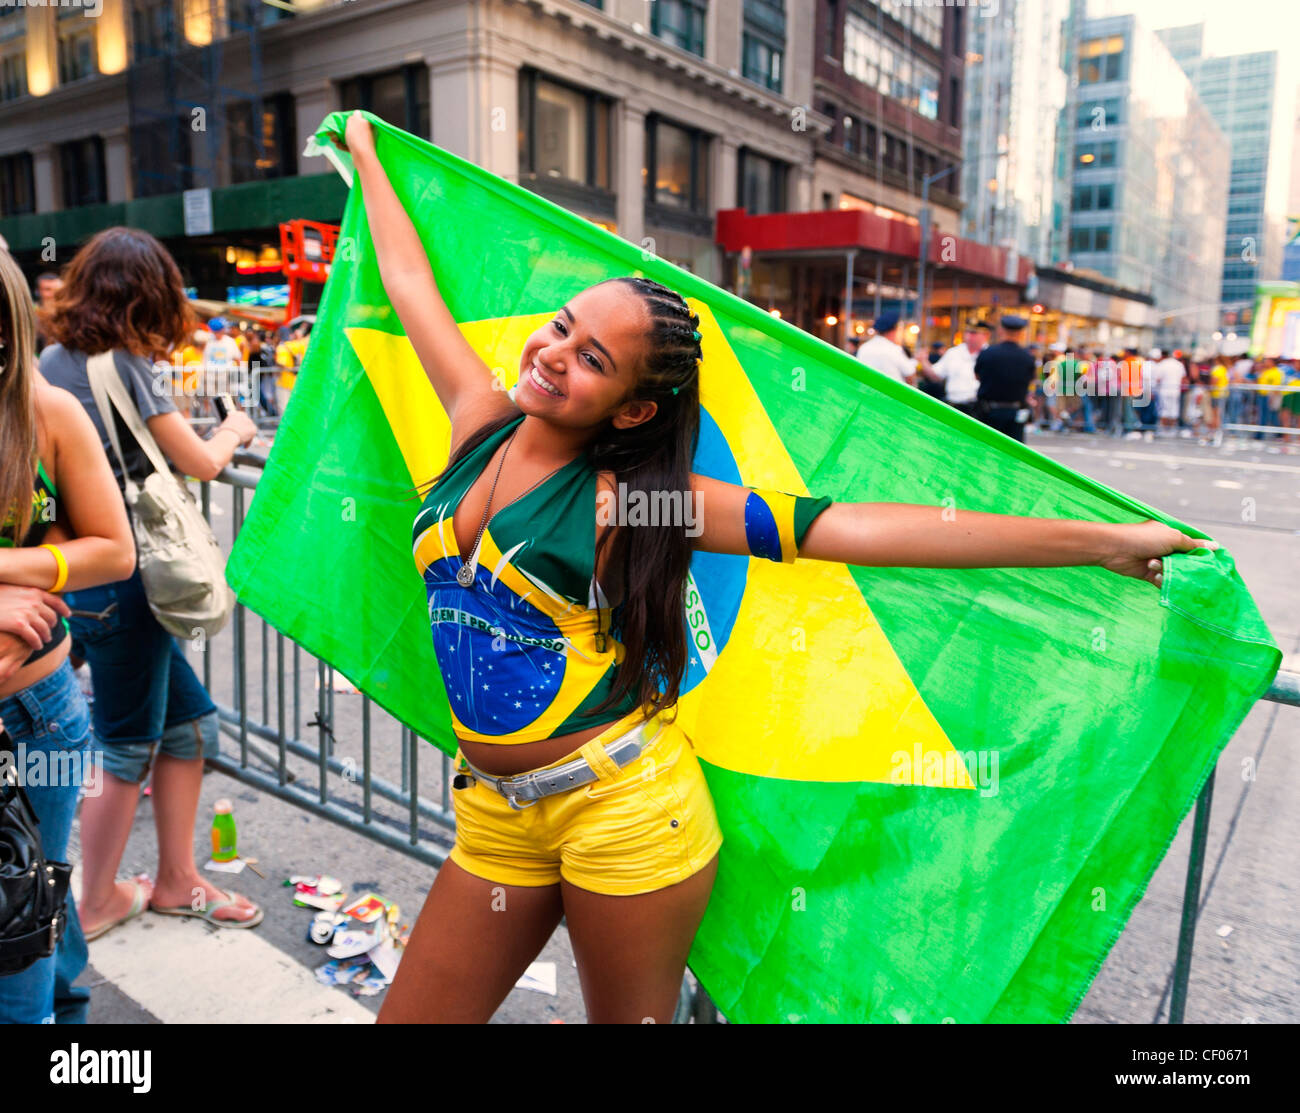 At Brazilian Day Festival, girl posing with Brasil flag, in Little Brazil, New York City, NY USA, on August 31, - Stock Image